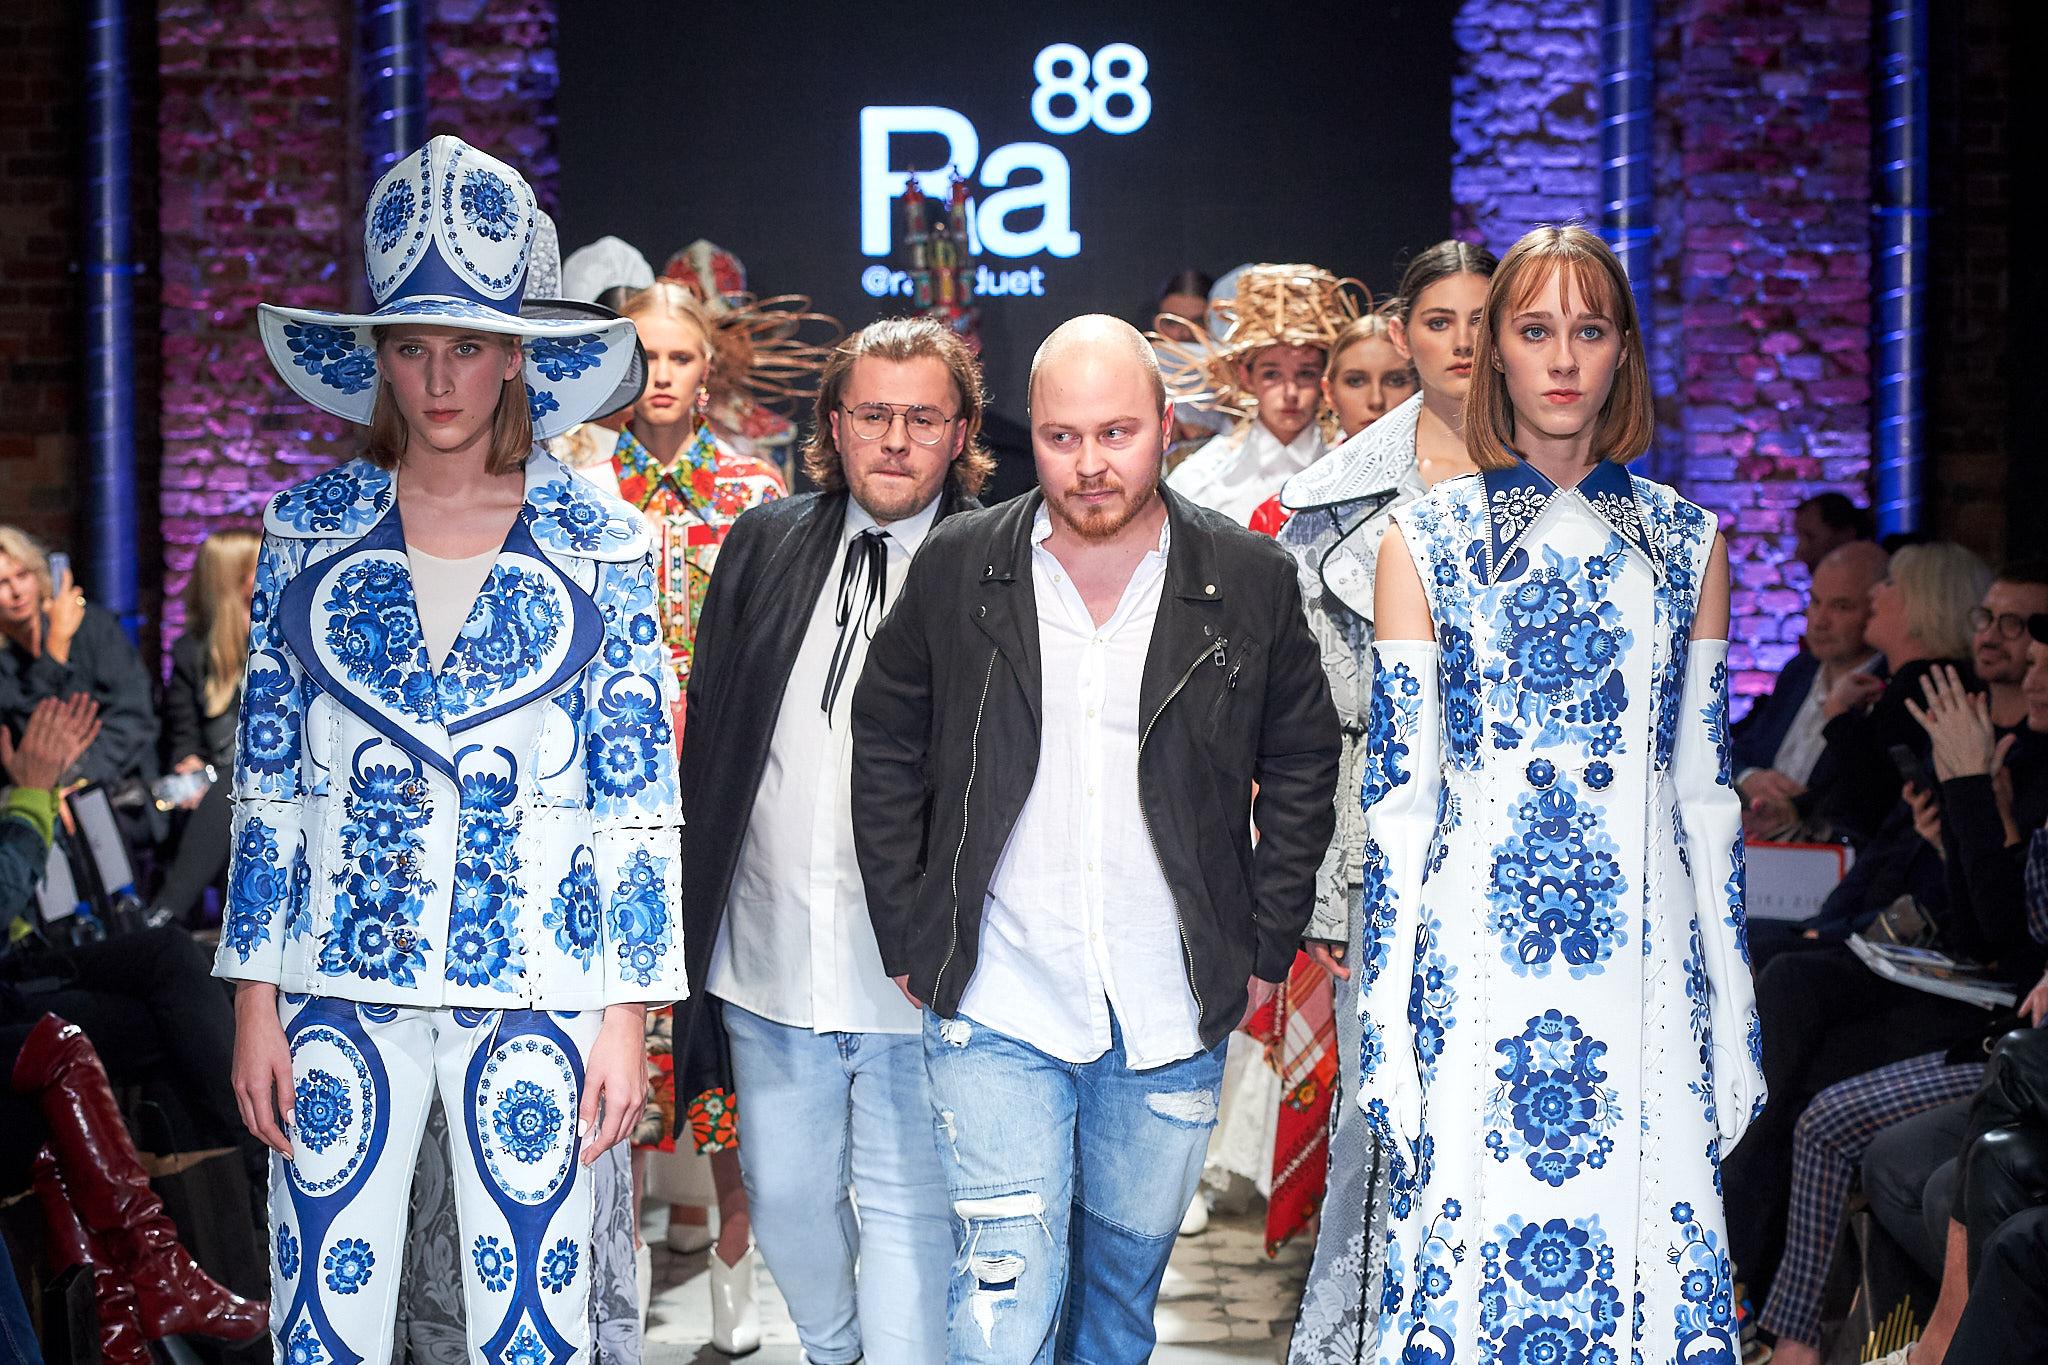 17_KTW_DAY1_111019_RAD_lowres-fotFilipOkopny-FashionImages